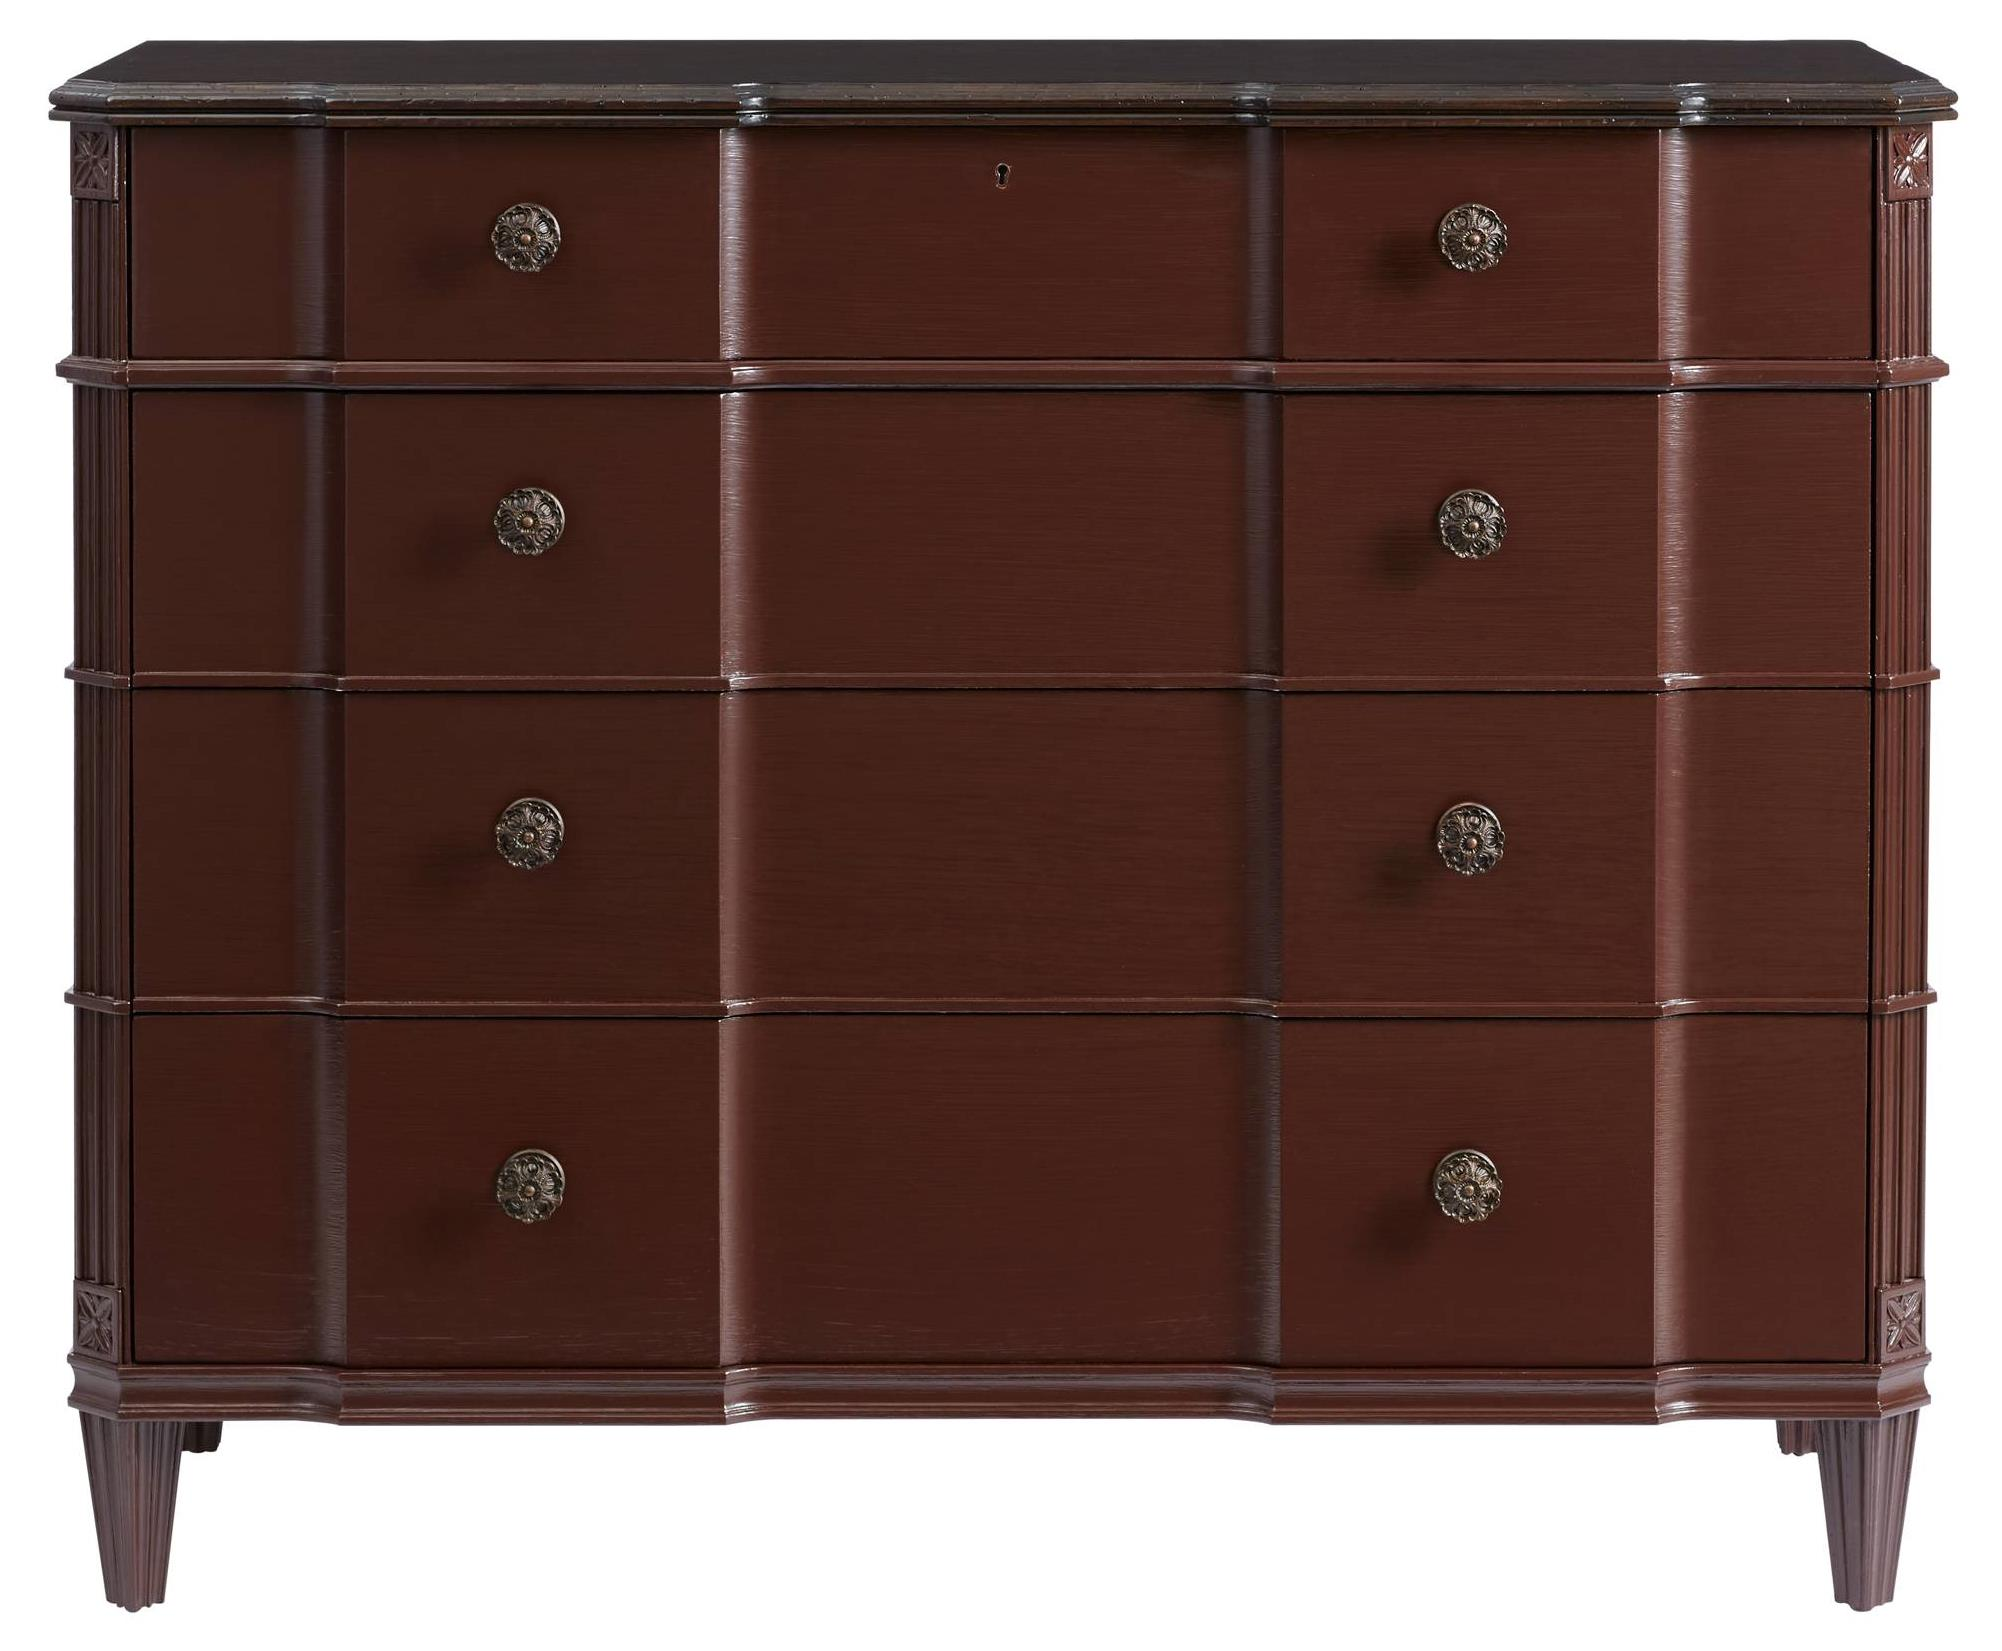 Stanley Furniture Villa Couture Claudia Single Dresser - Item Number: 510-73-04